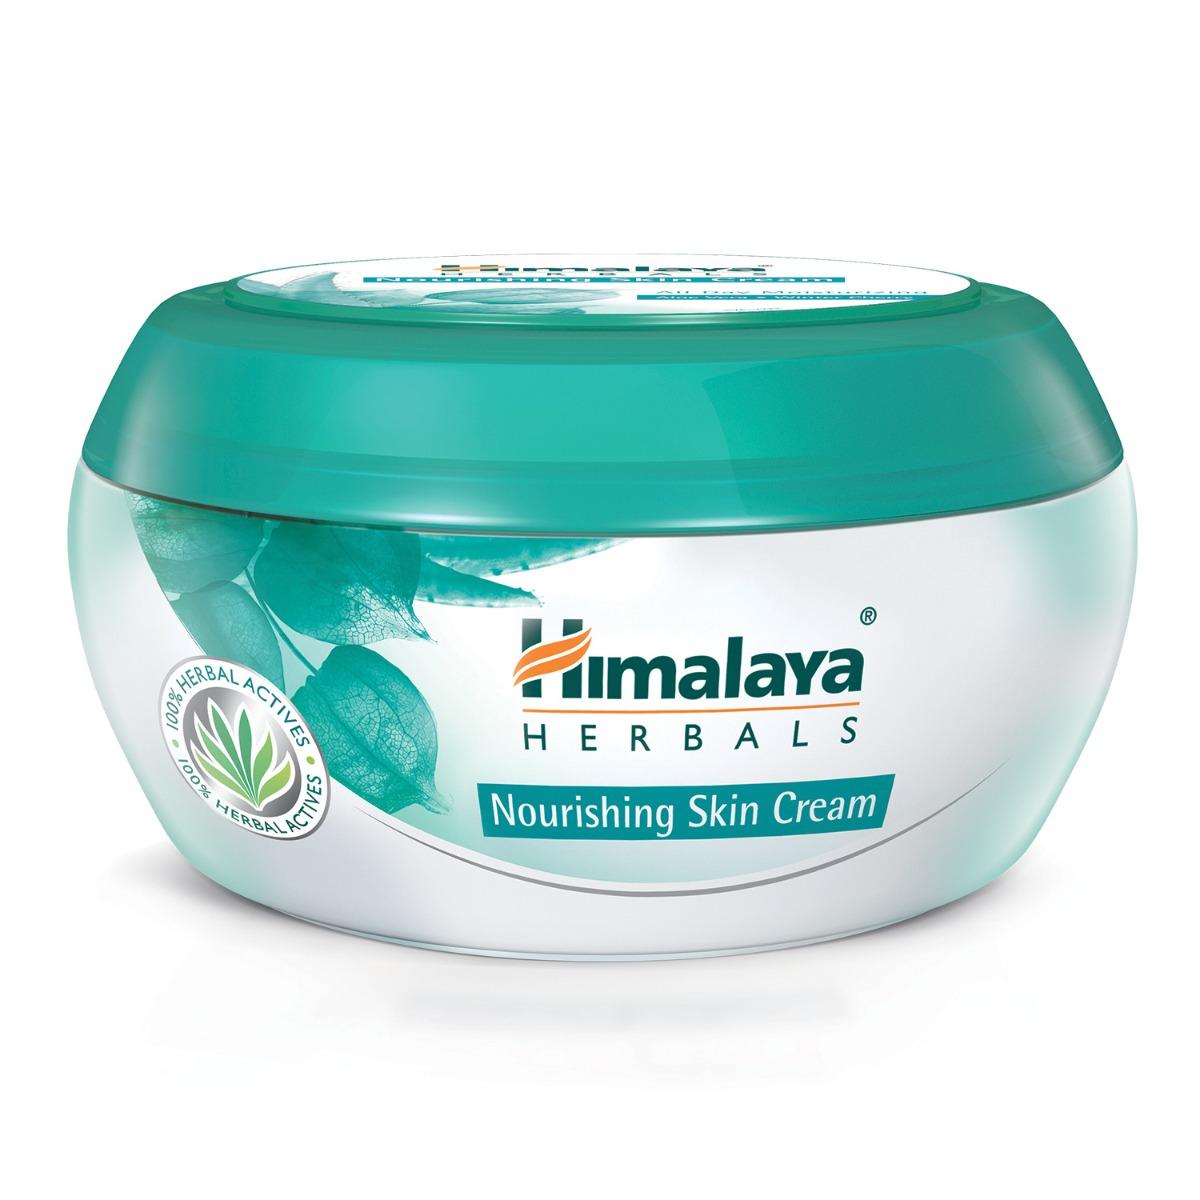 Crema hidratanta pentru corp Himalaya, 150 ml imagine